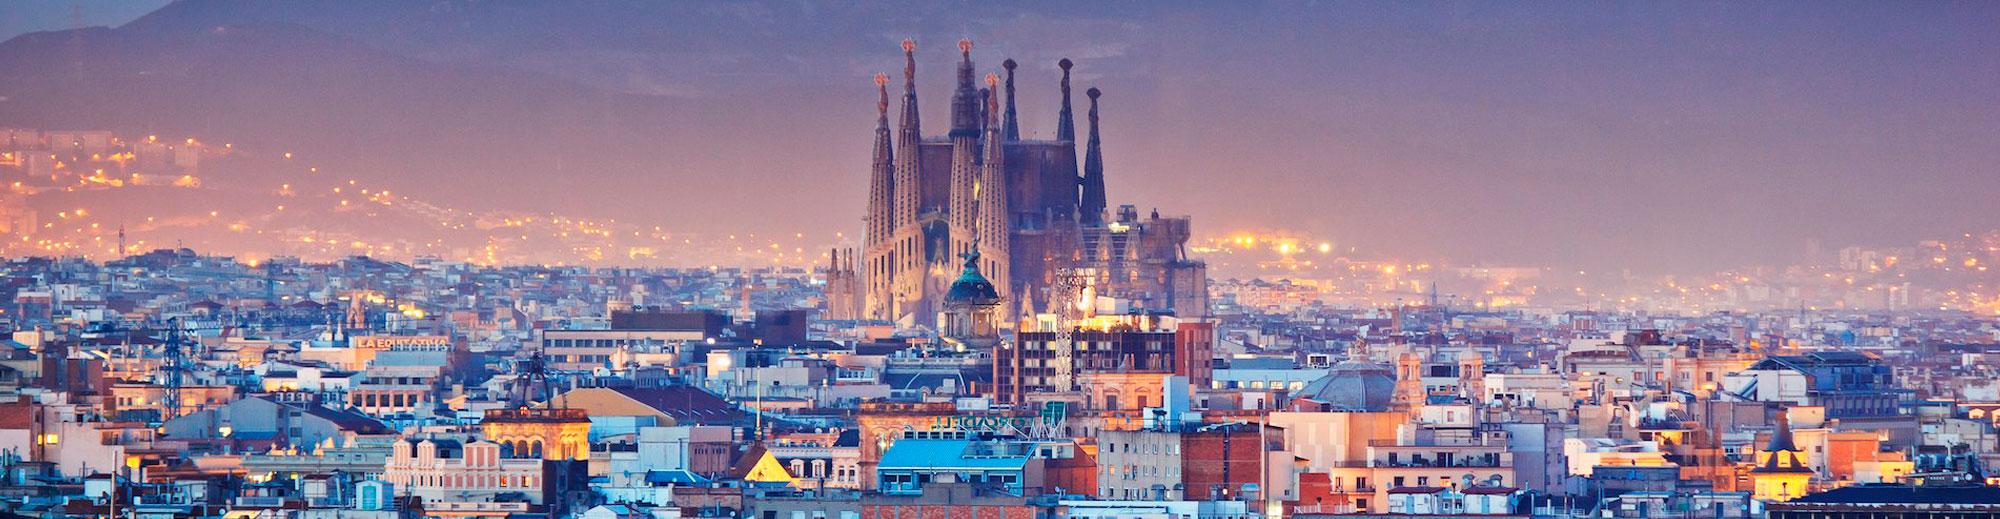 Lucas y Arthur Jussen tocan en Pamplona y Barcelona